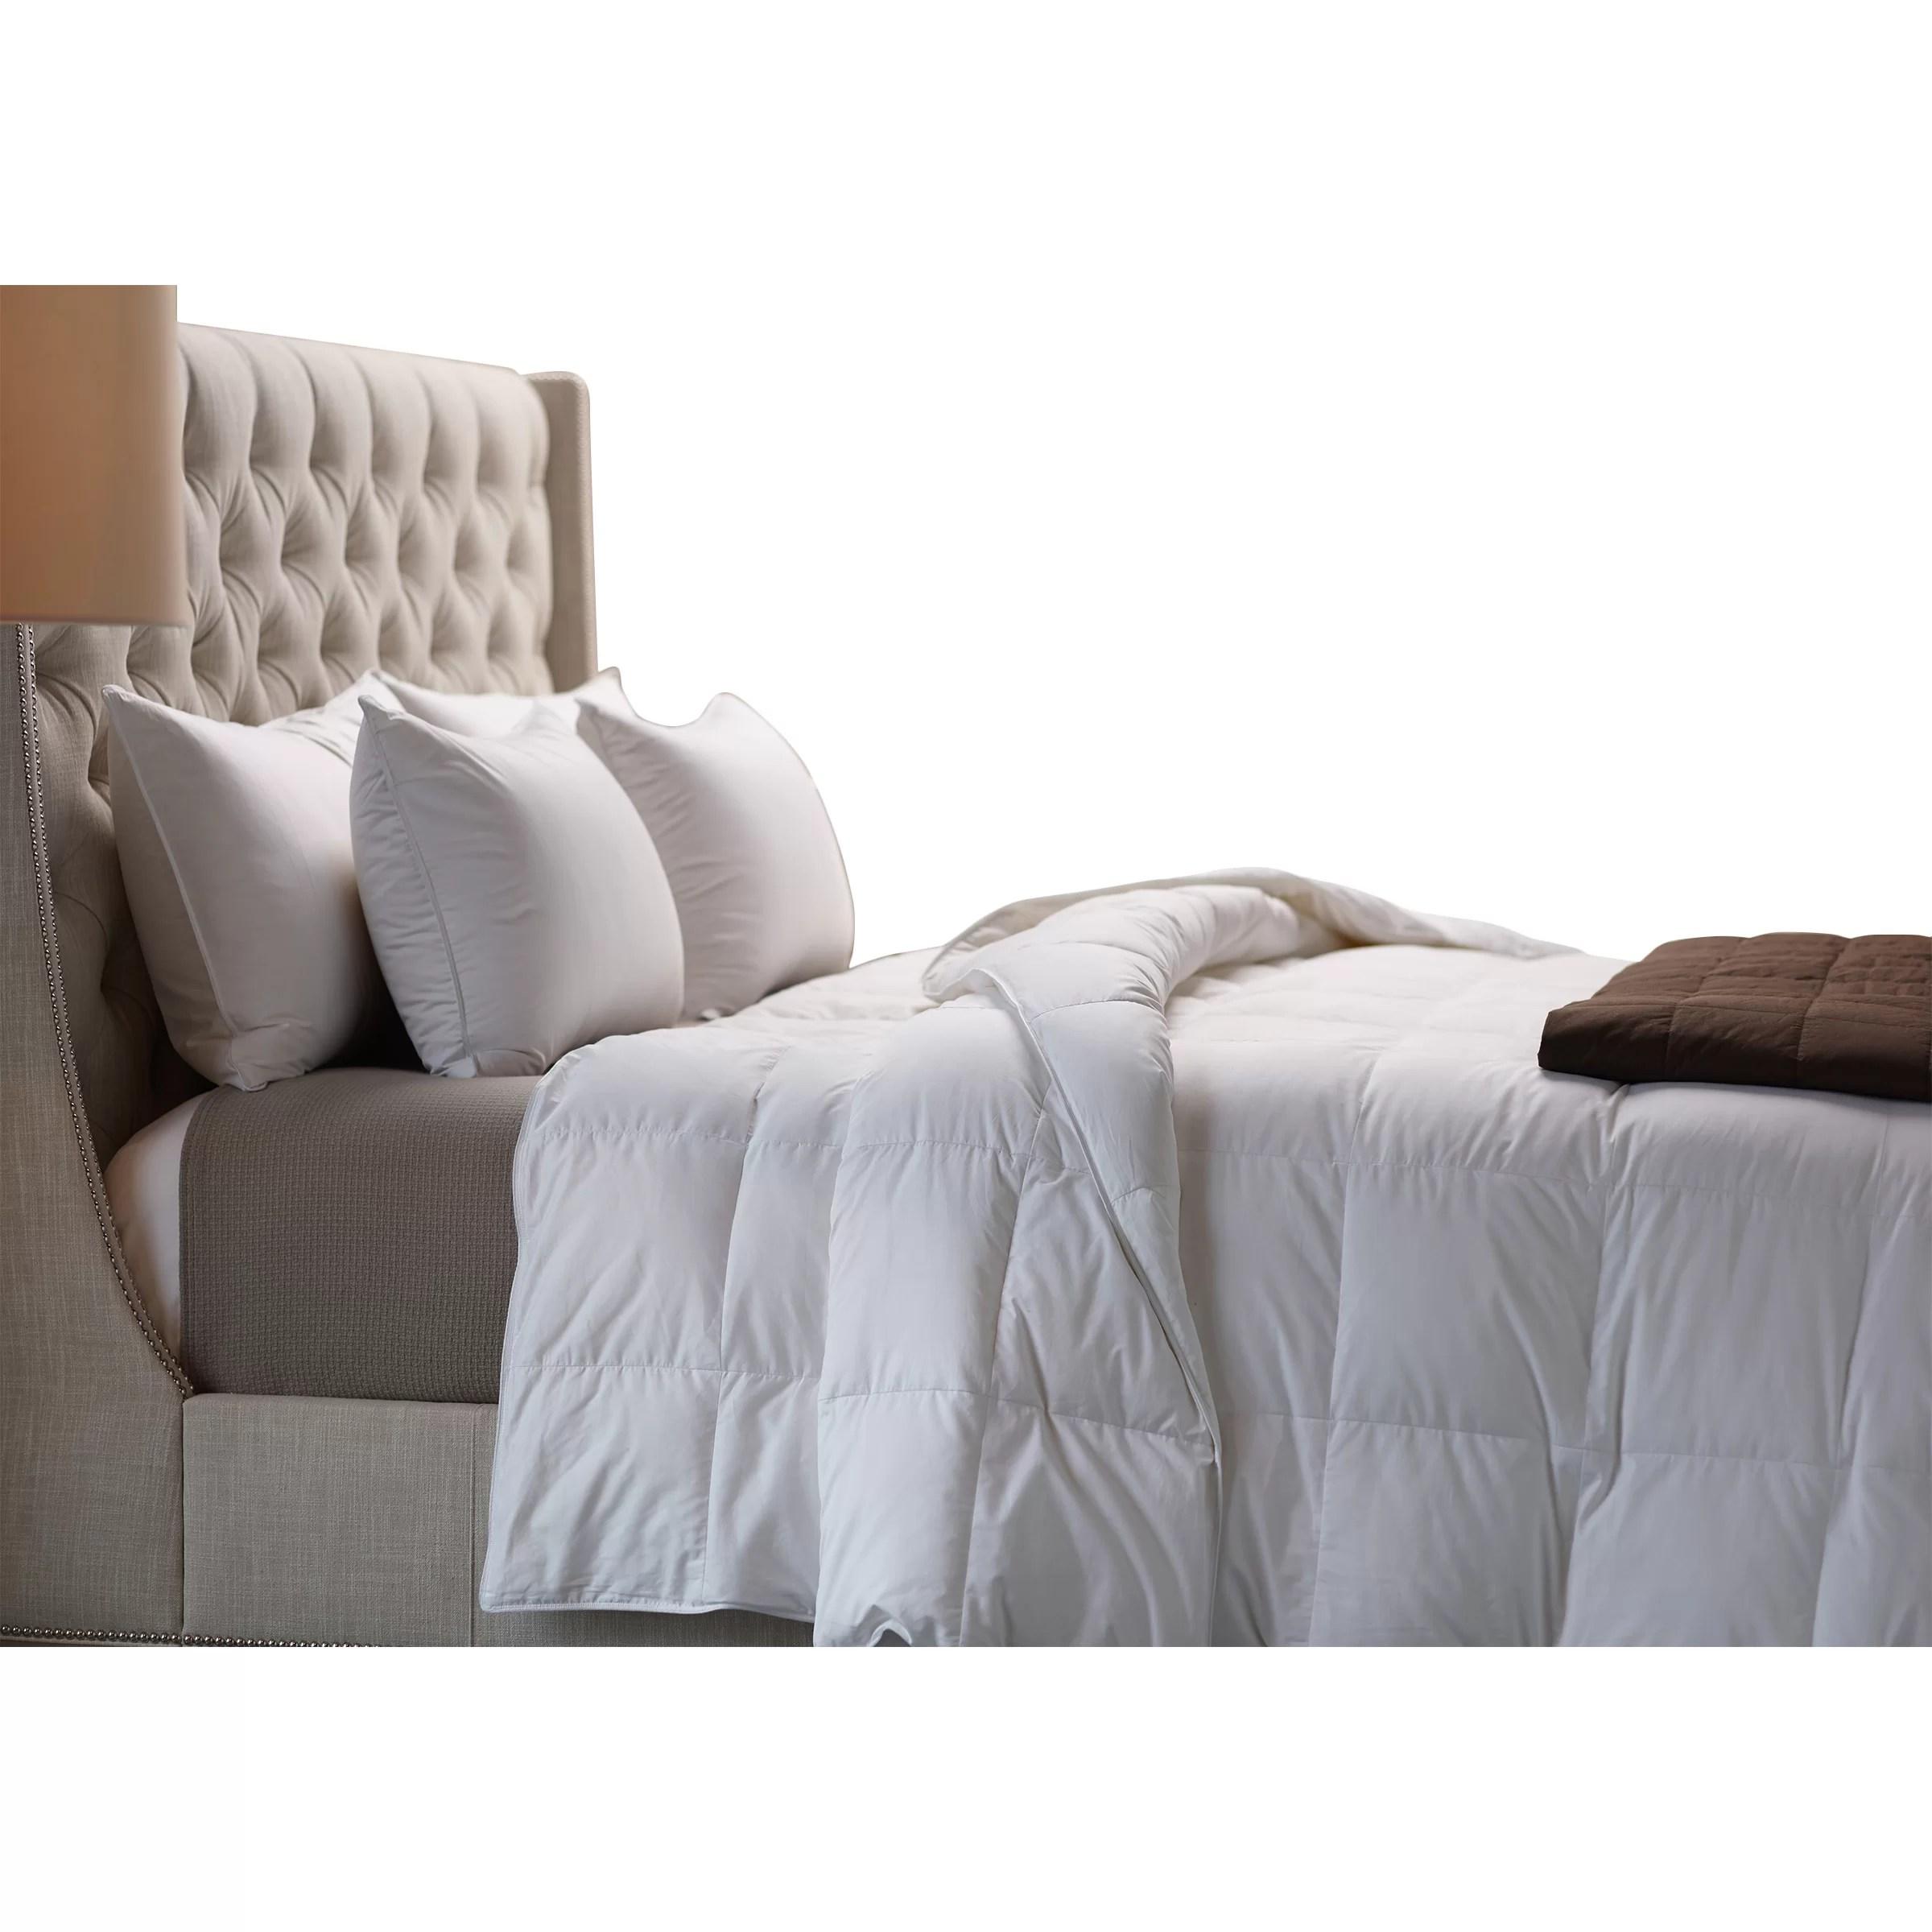 comforter pin king duvet store company goose insert x down supreme